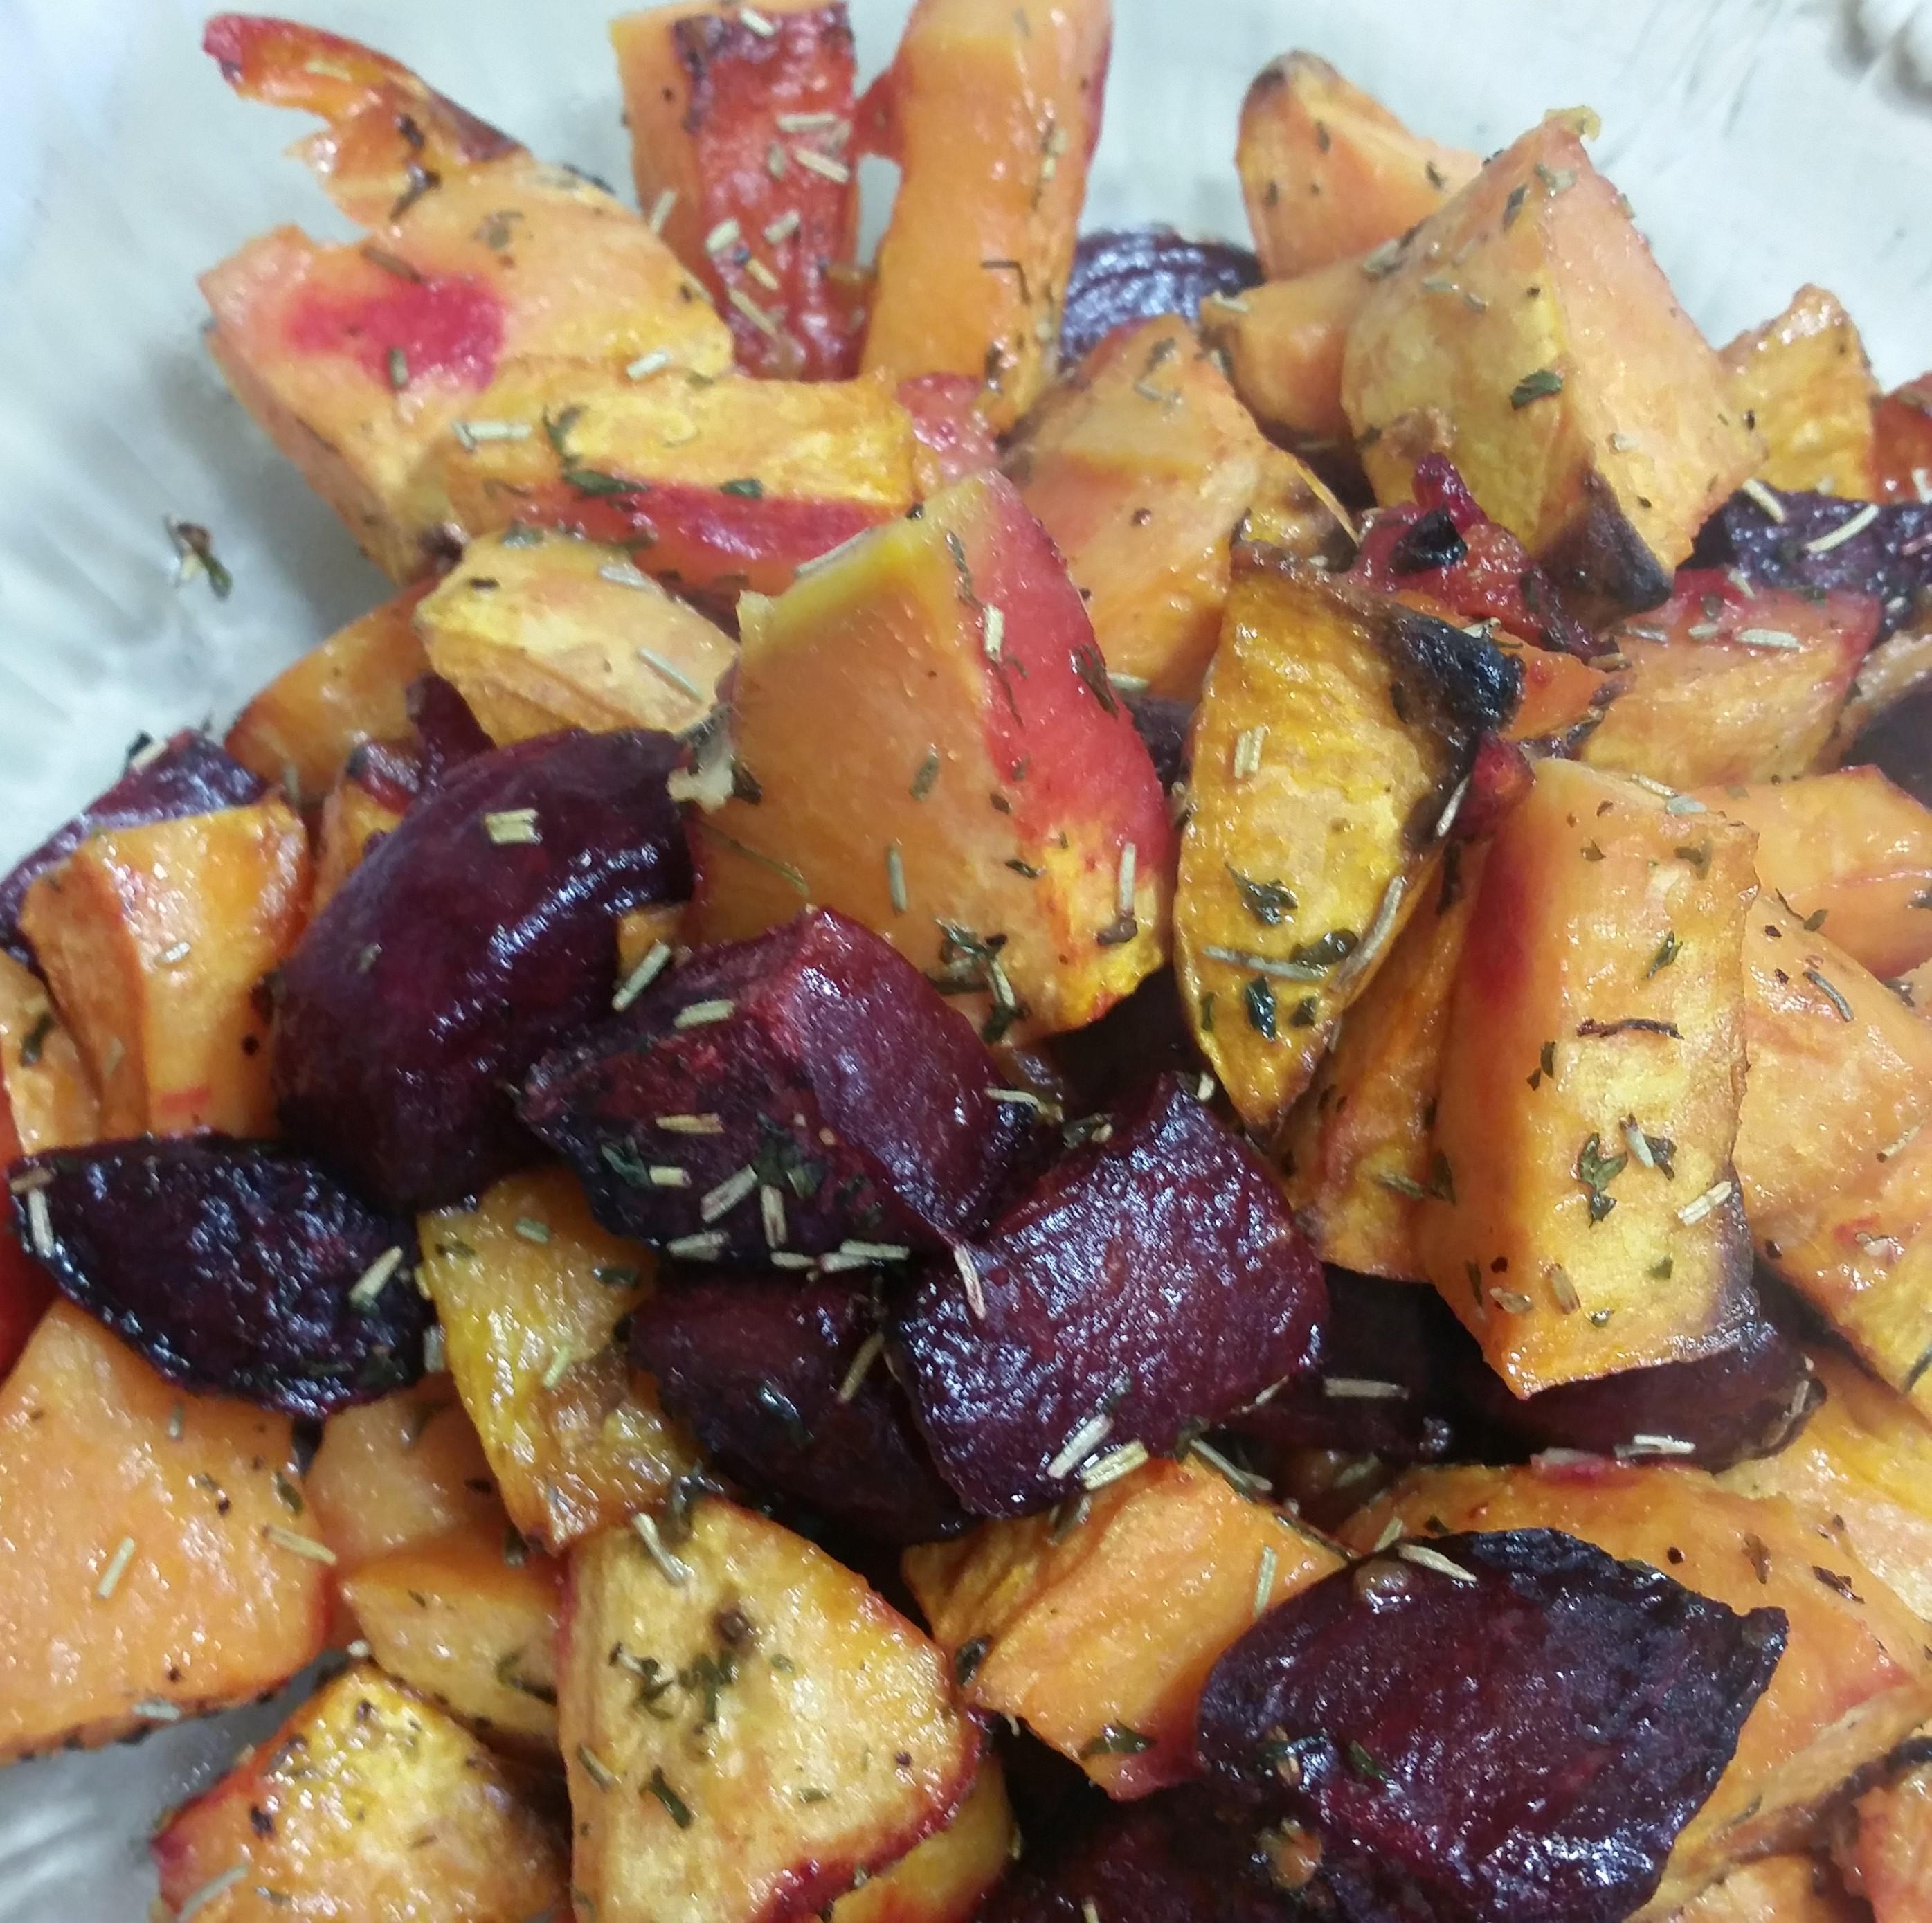 sweet potatos and beets with sweet orange